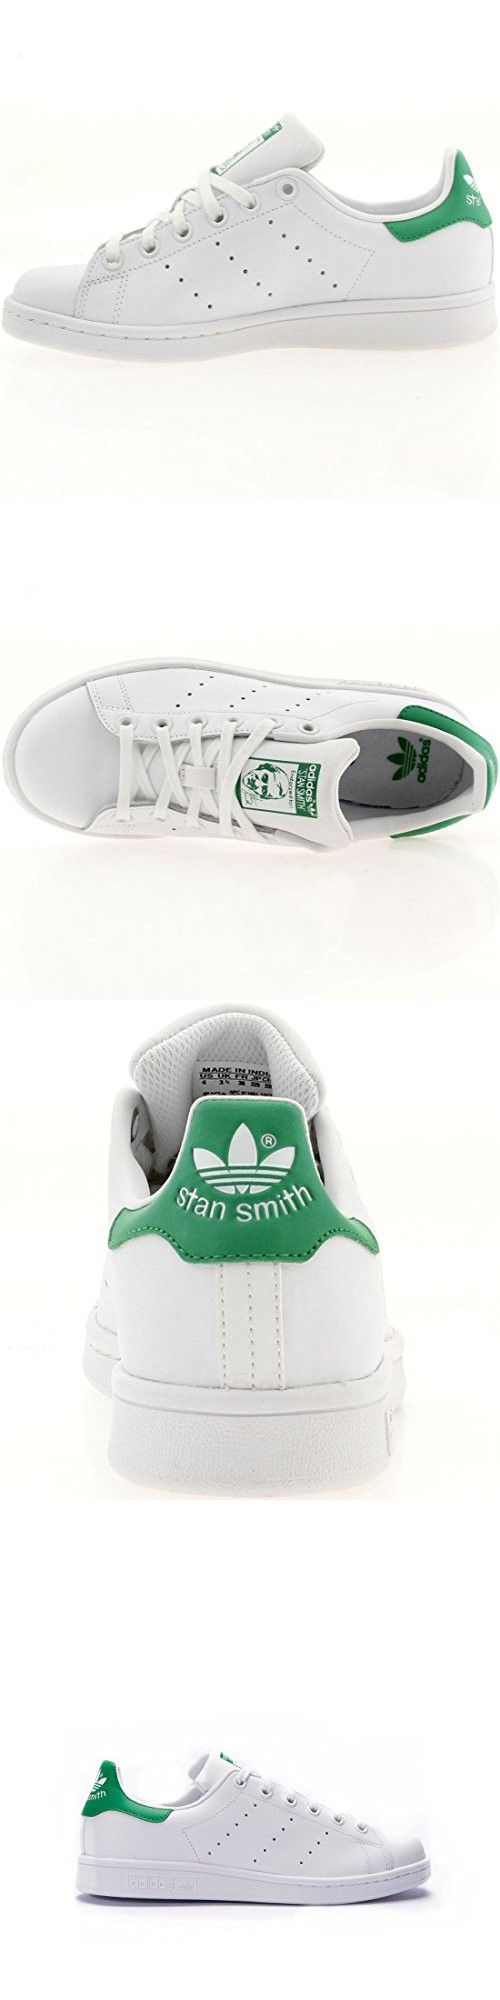 Adidas skate shoes zumiez - Adidas Originals Boys Stan Smith J Skate Shoe White White Green